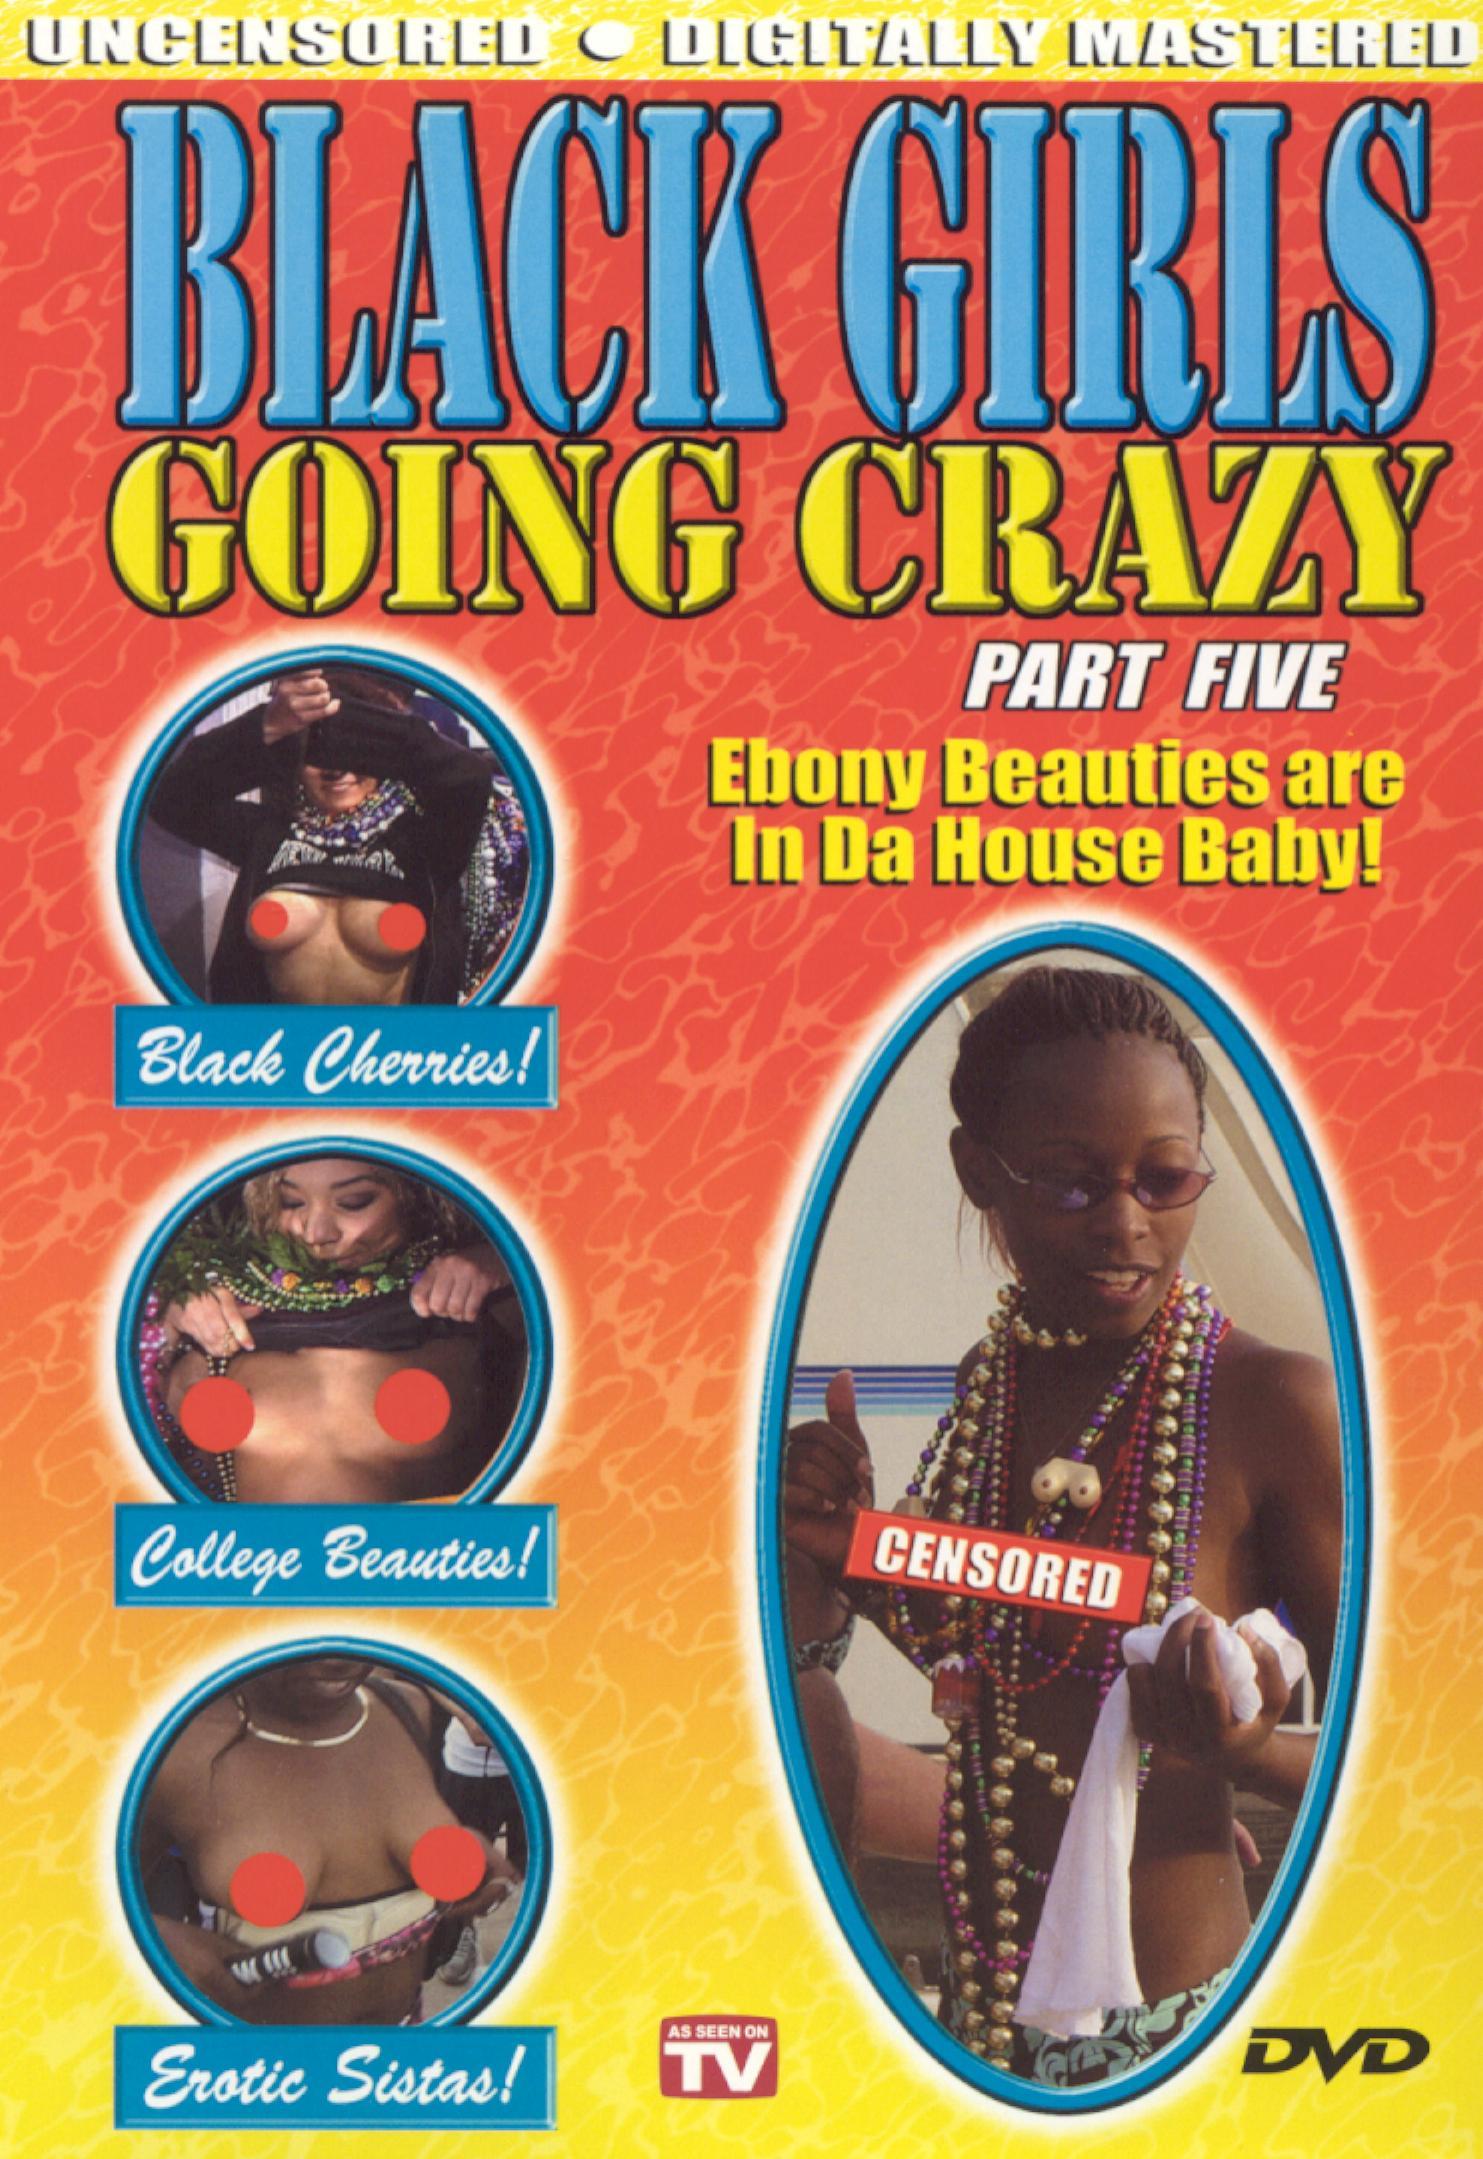 Black Girls Going Crazy, Vol. 5